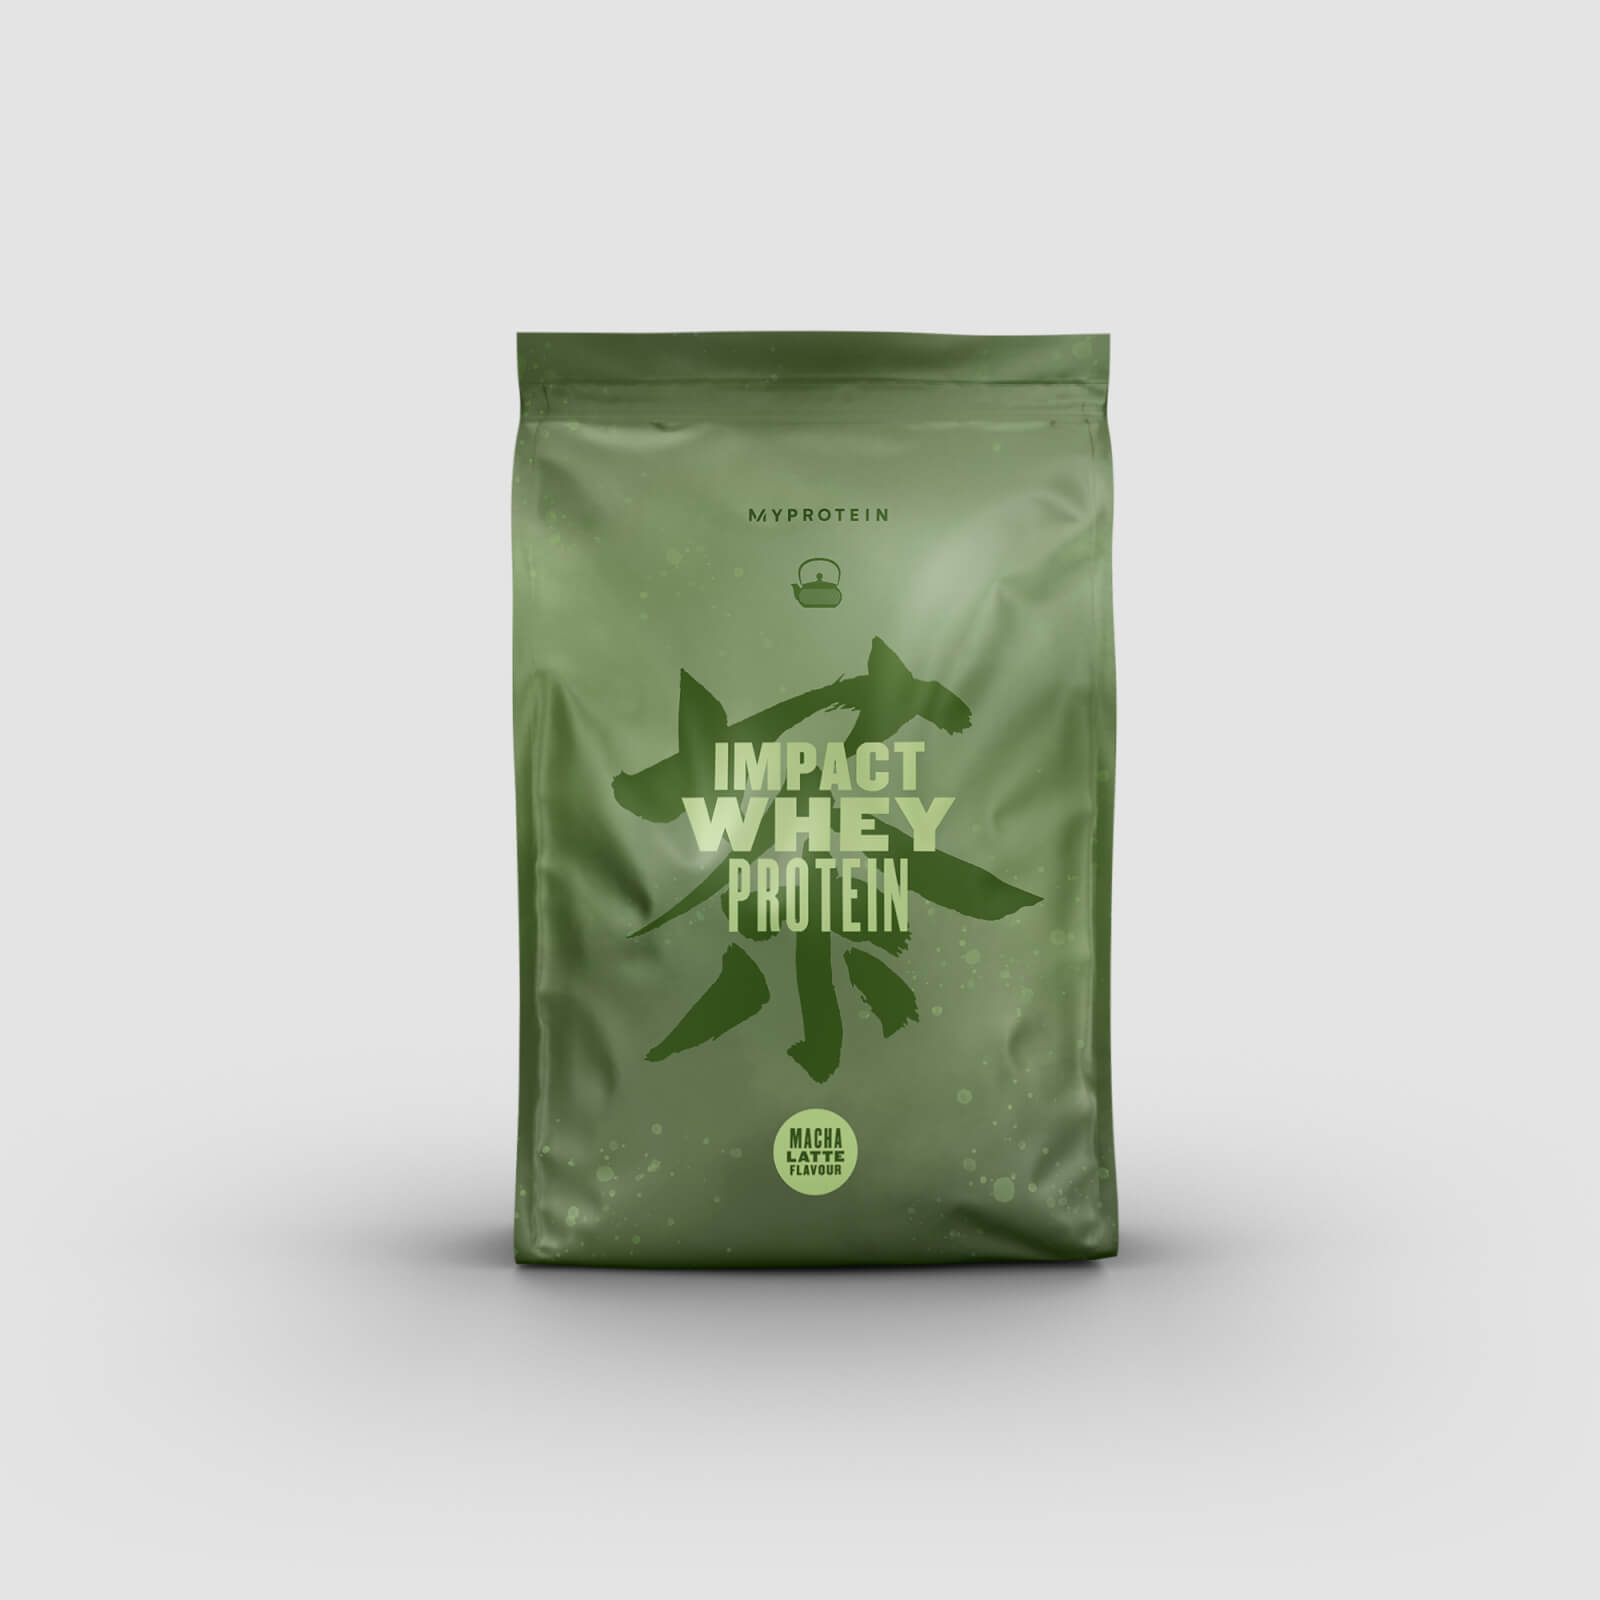 Купить Сывороточный протеин (Impact Whey Protein) - 2.5kg - Matcha Latte, Myprotein International